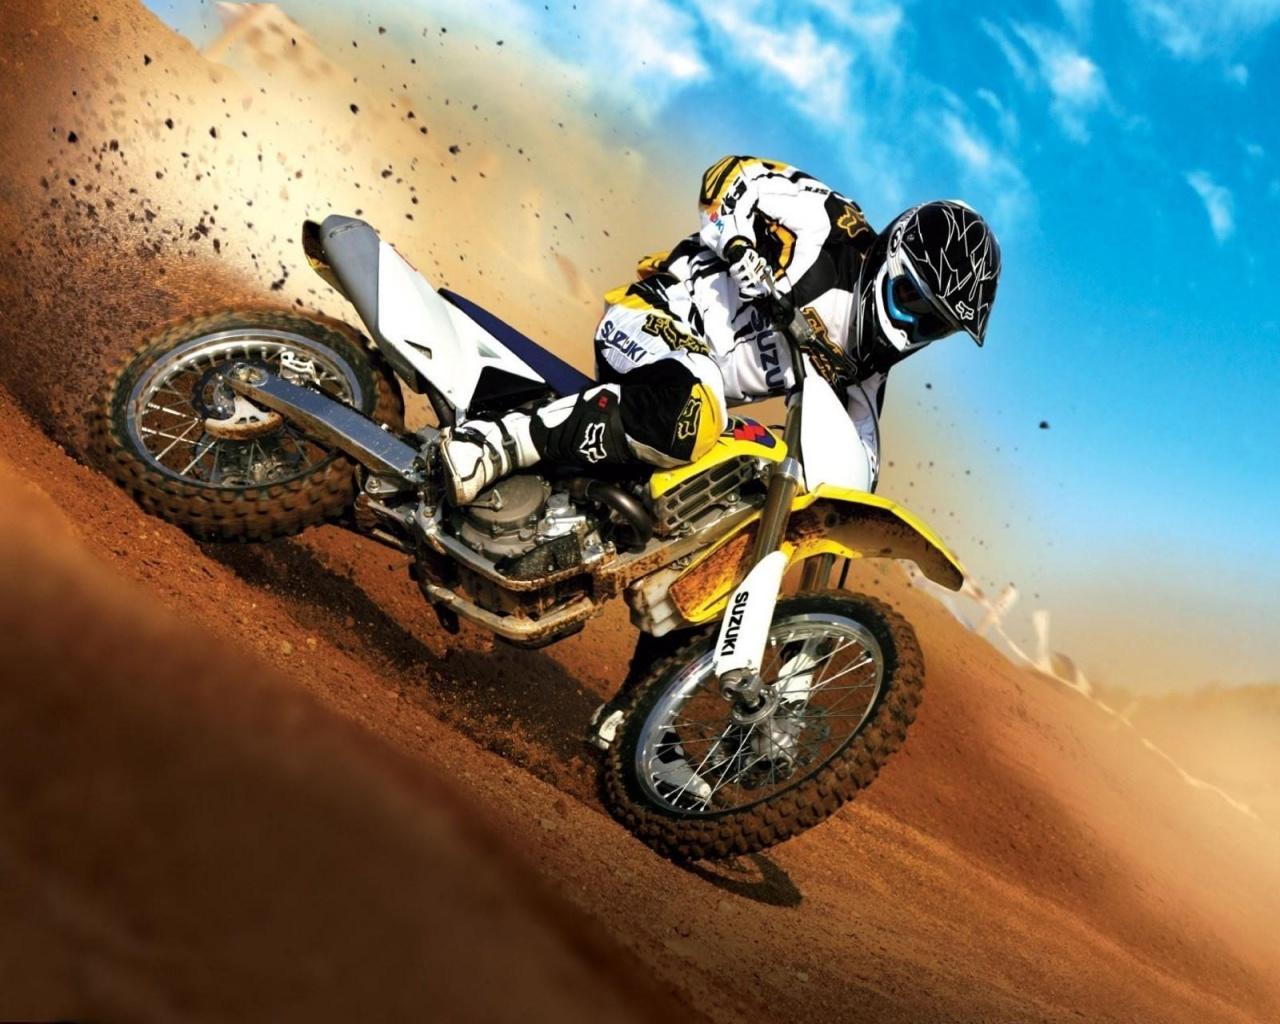 1280x1024 Super Dirt Bike desktop PC and Mac wallpaper 1280x1024